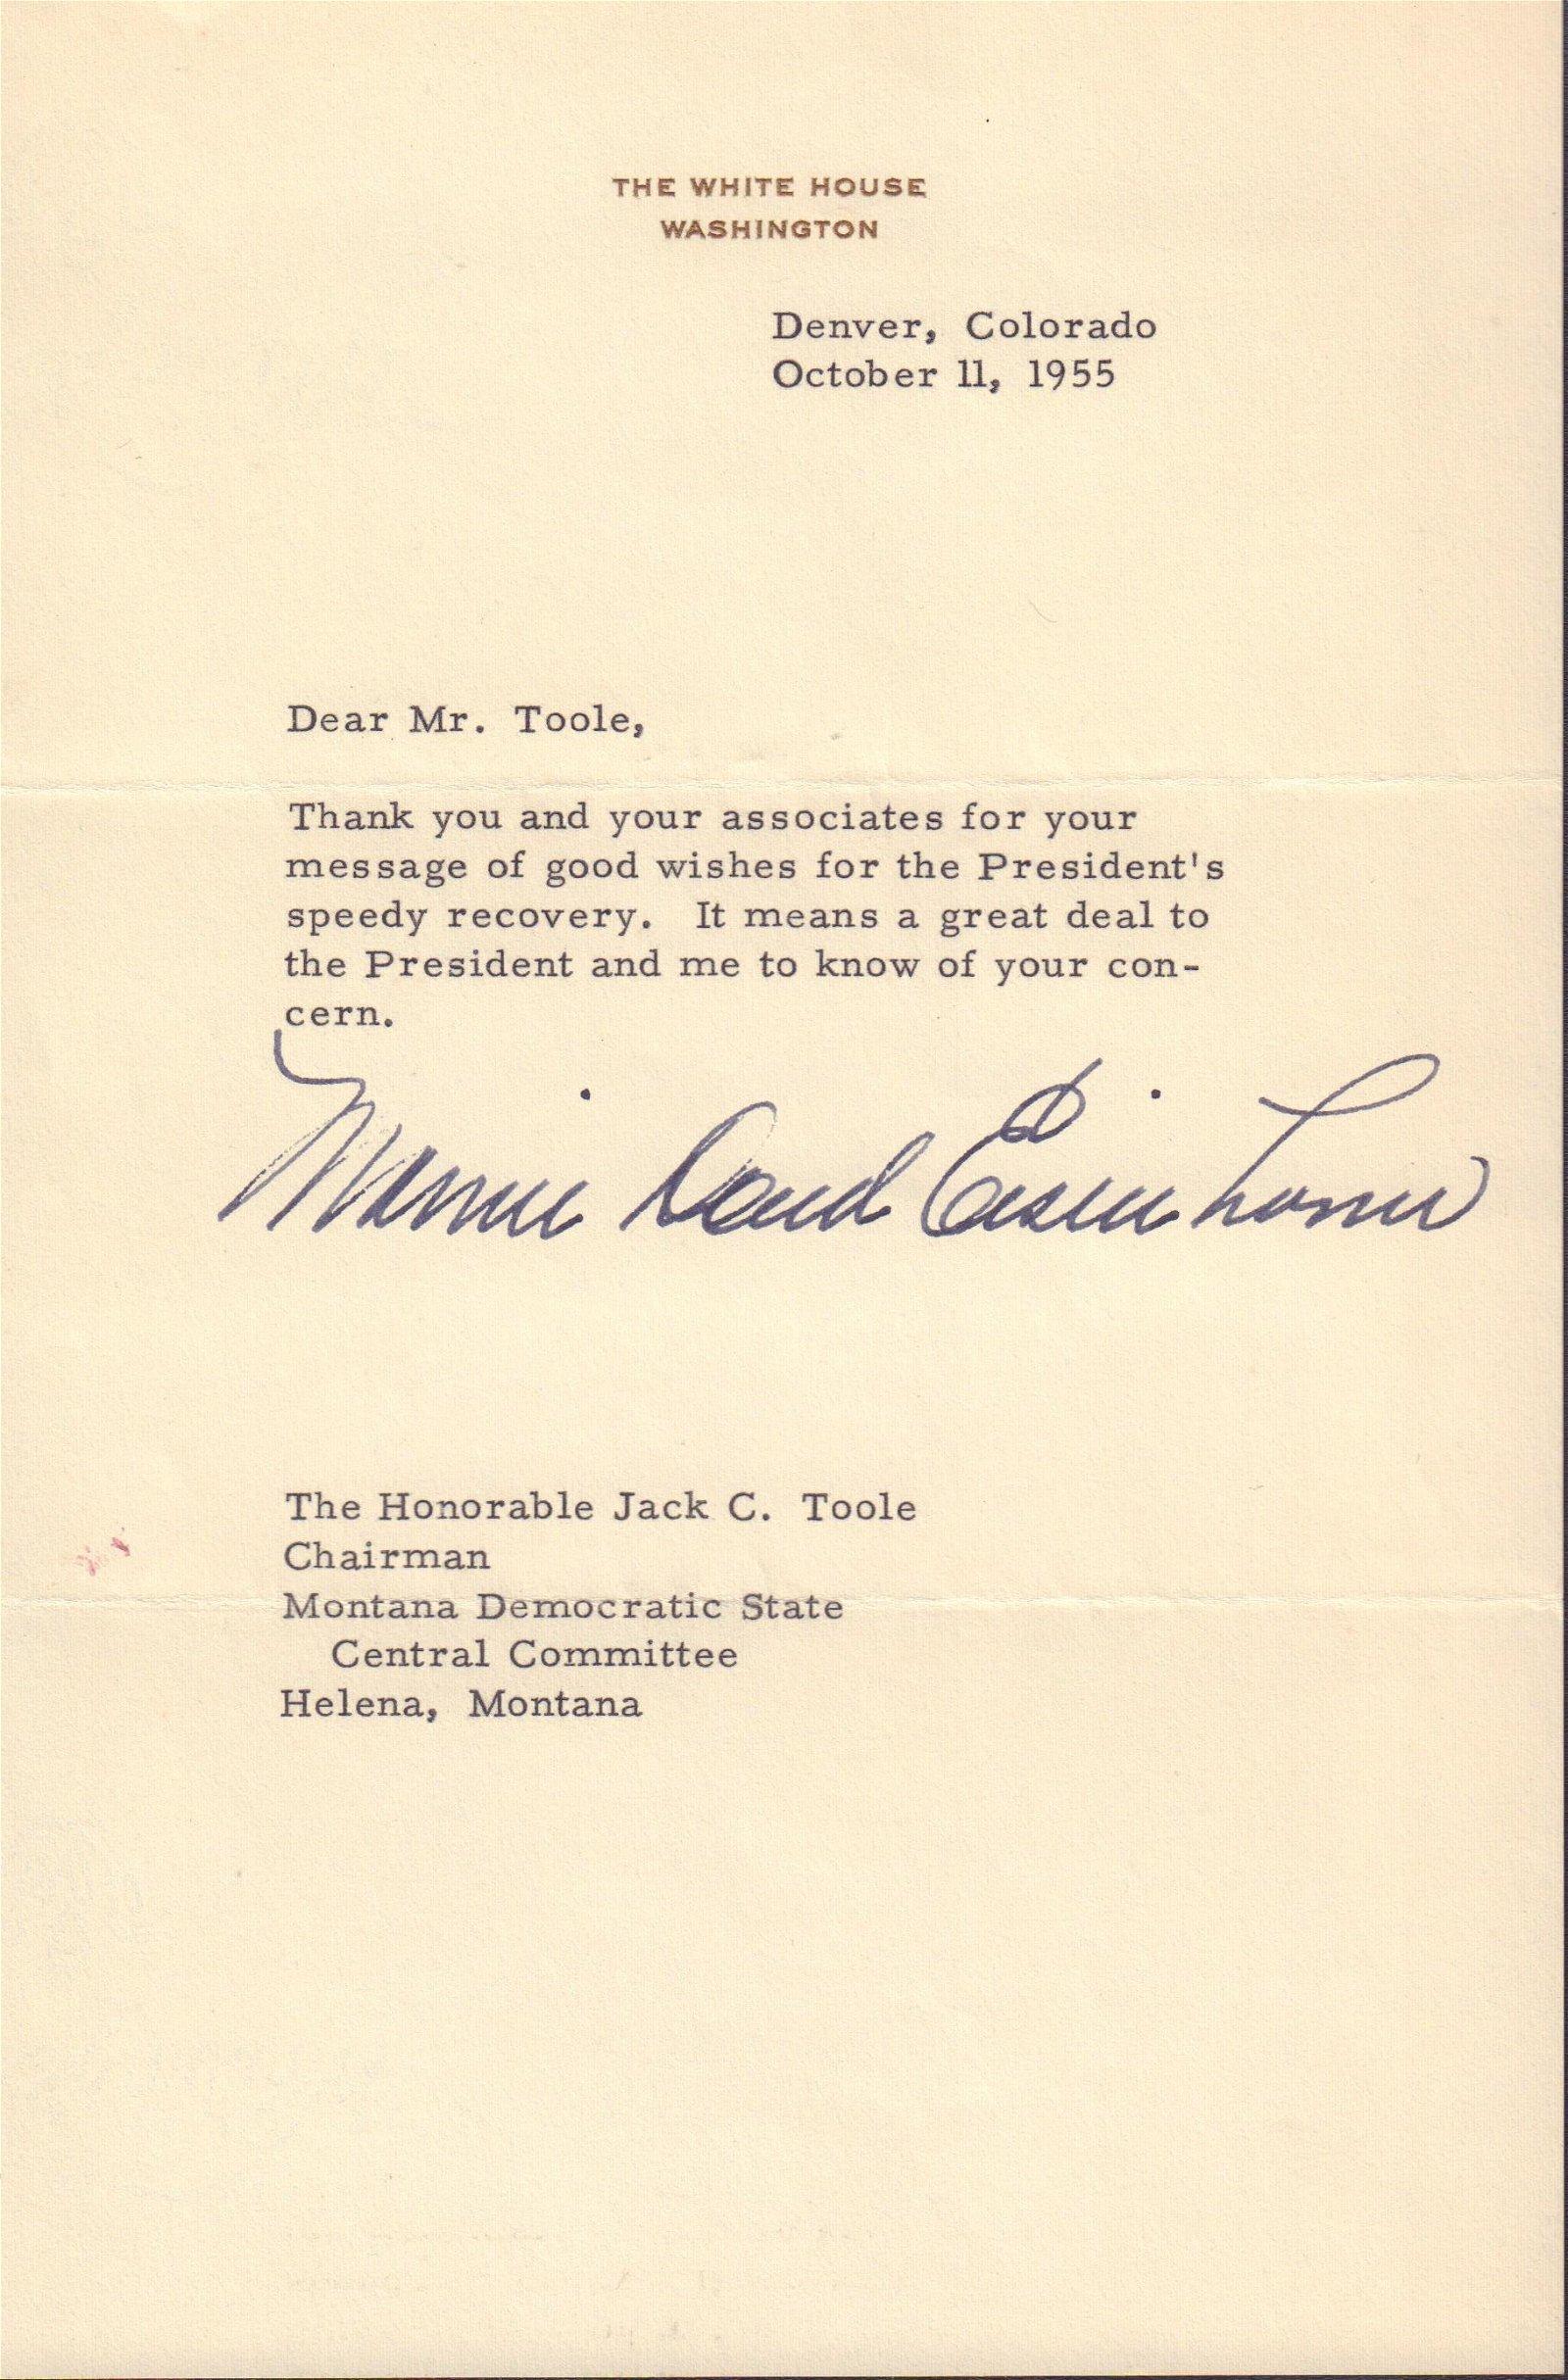 Mamie Doud Eisenhower